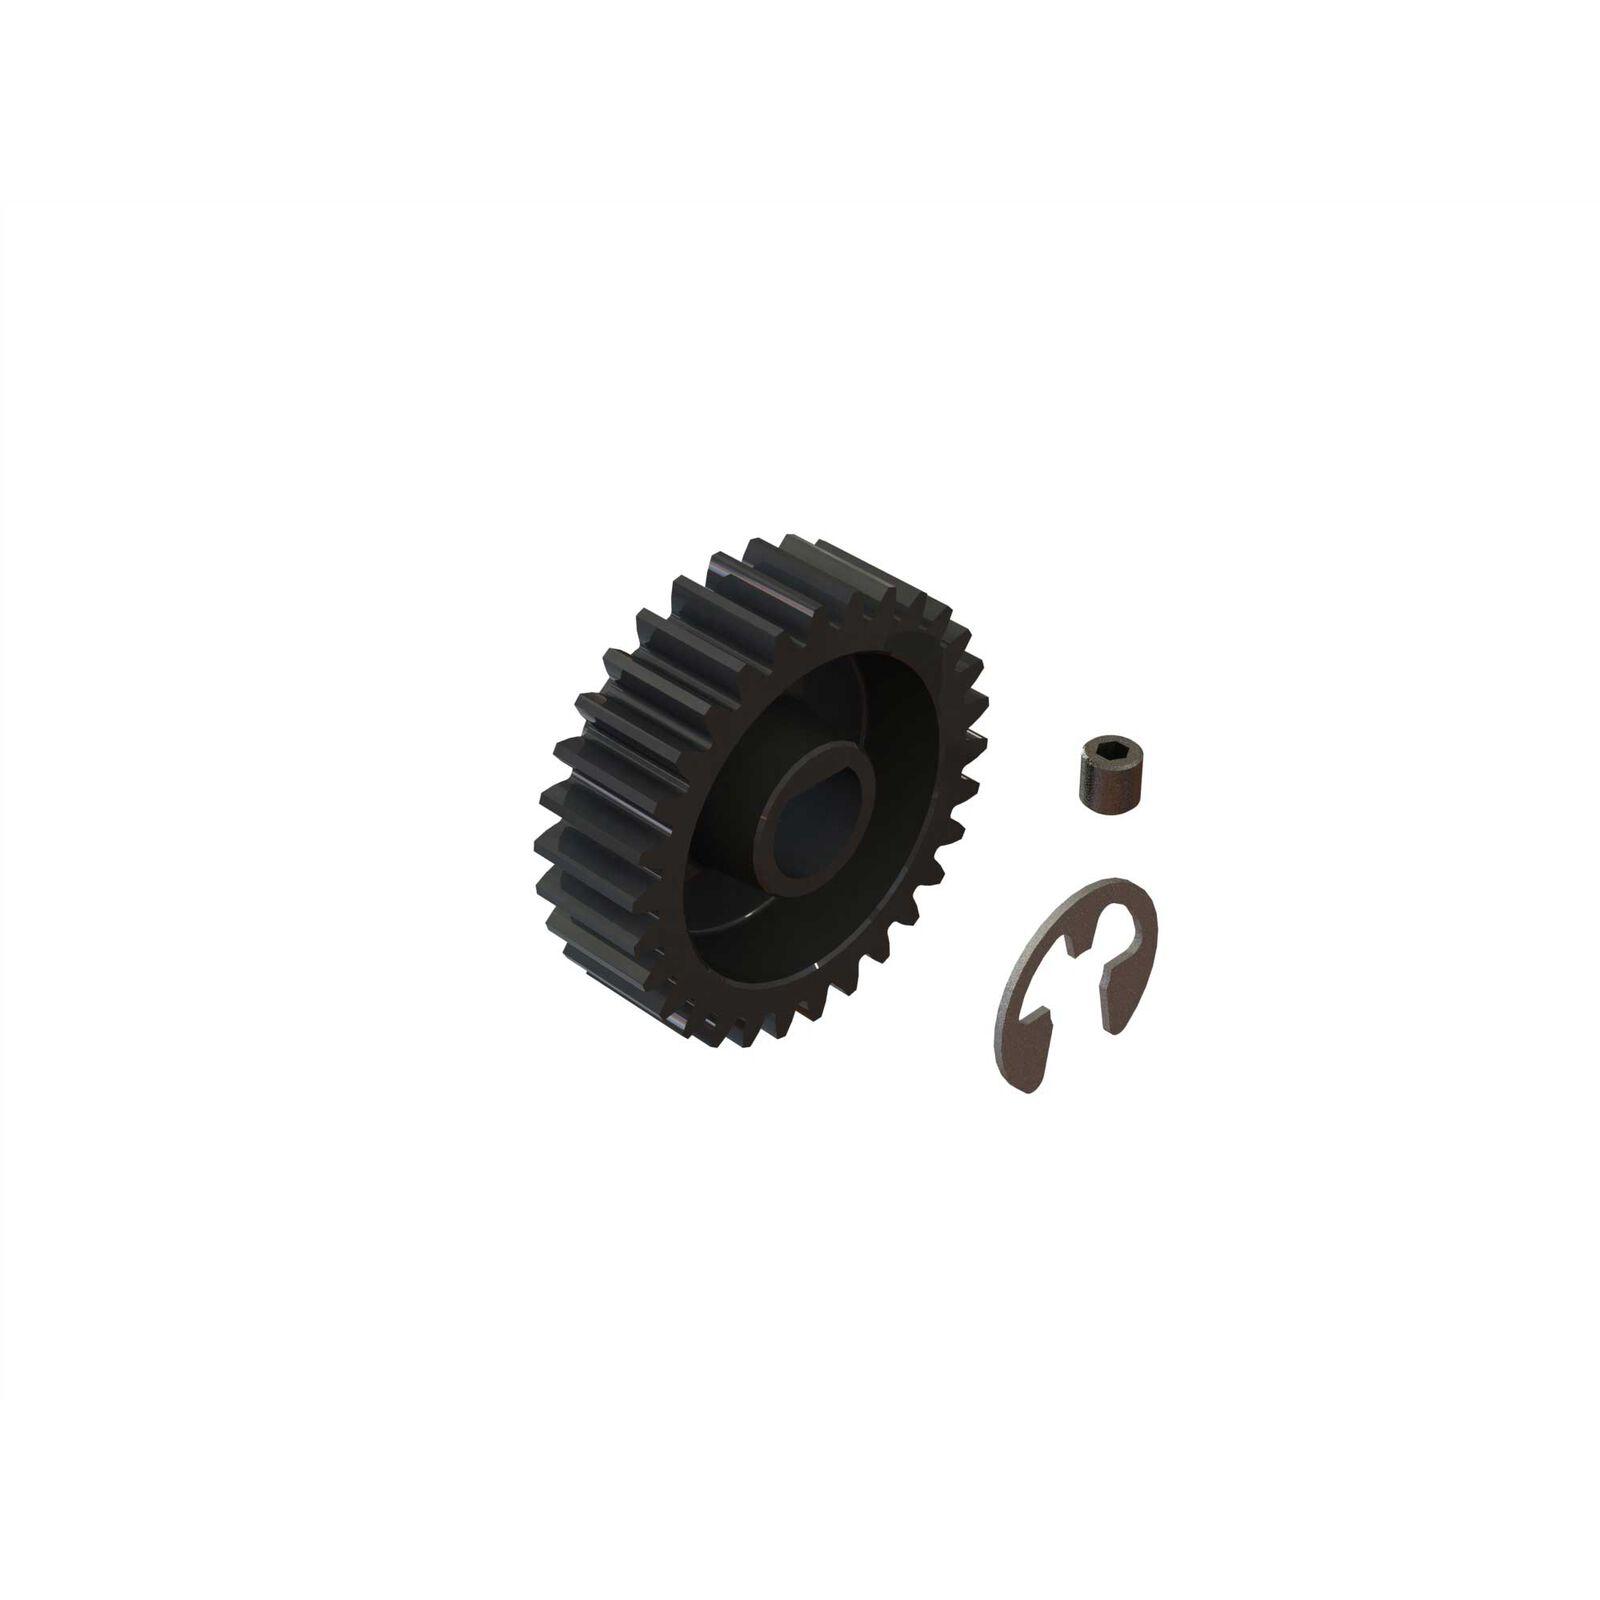 30T Mod1 Safe-D8 Pinion Gear